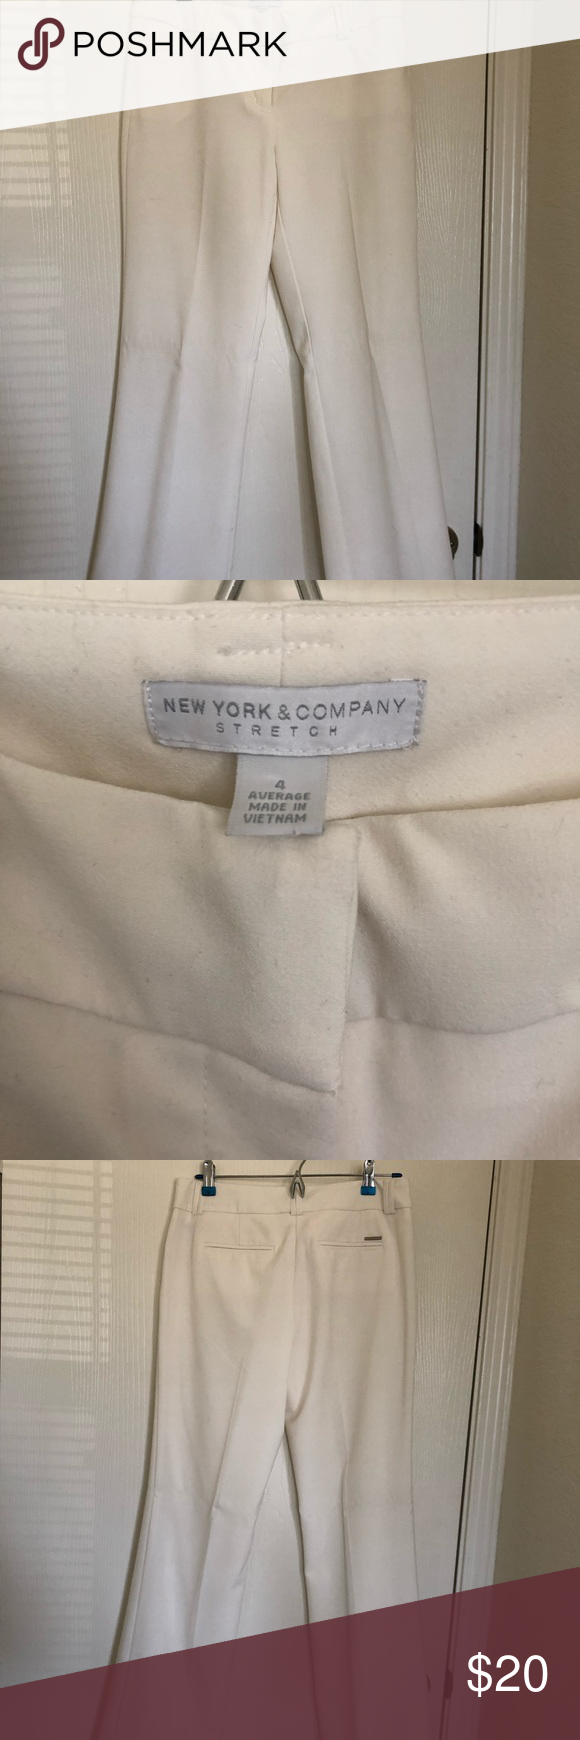 White slacks Perfect white slacks for work New York & Company Pants Trousers #whiteslacks White slacks Perfect white slacks for work New York & Company Pants Trousers #whiteslacks